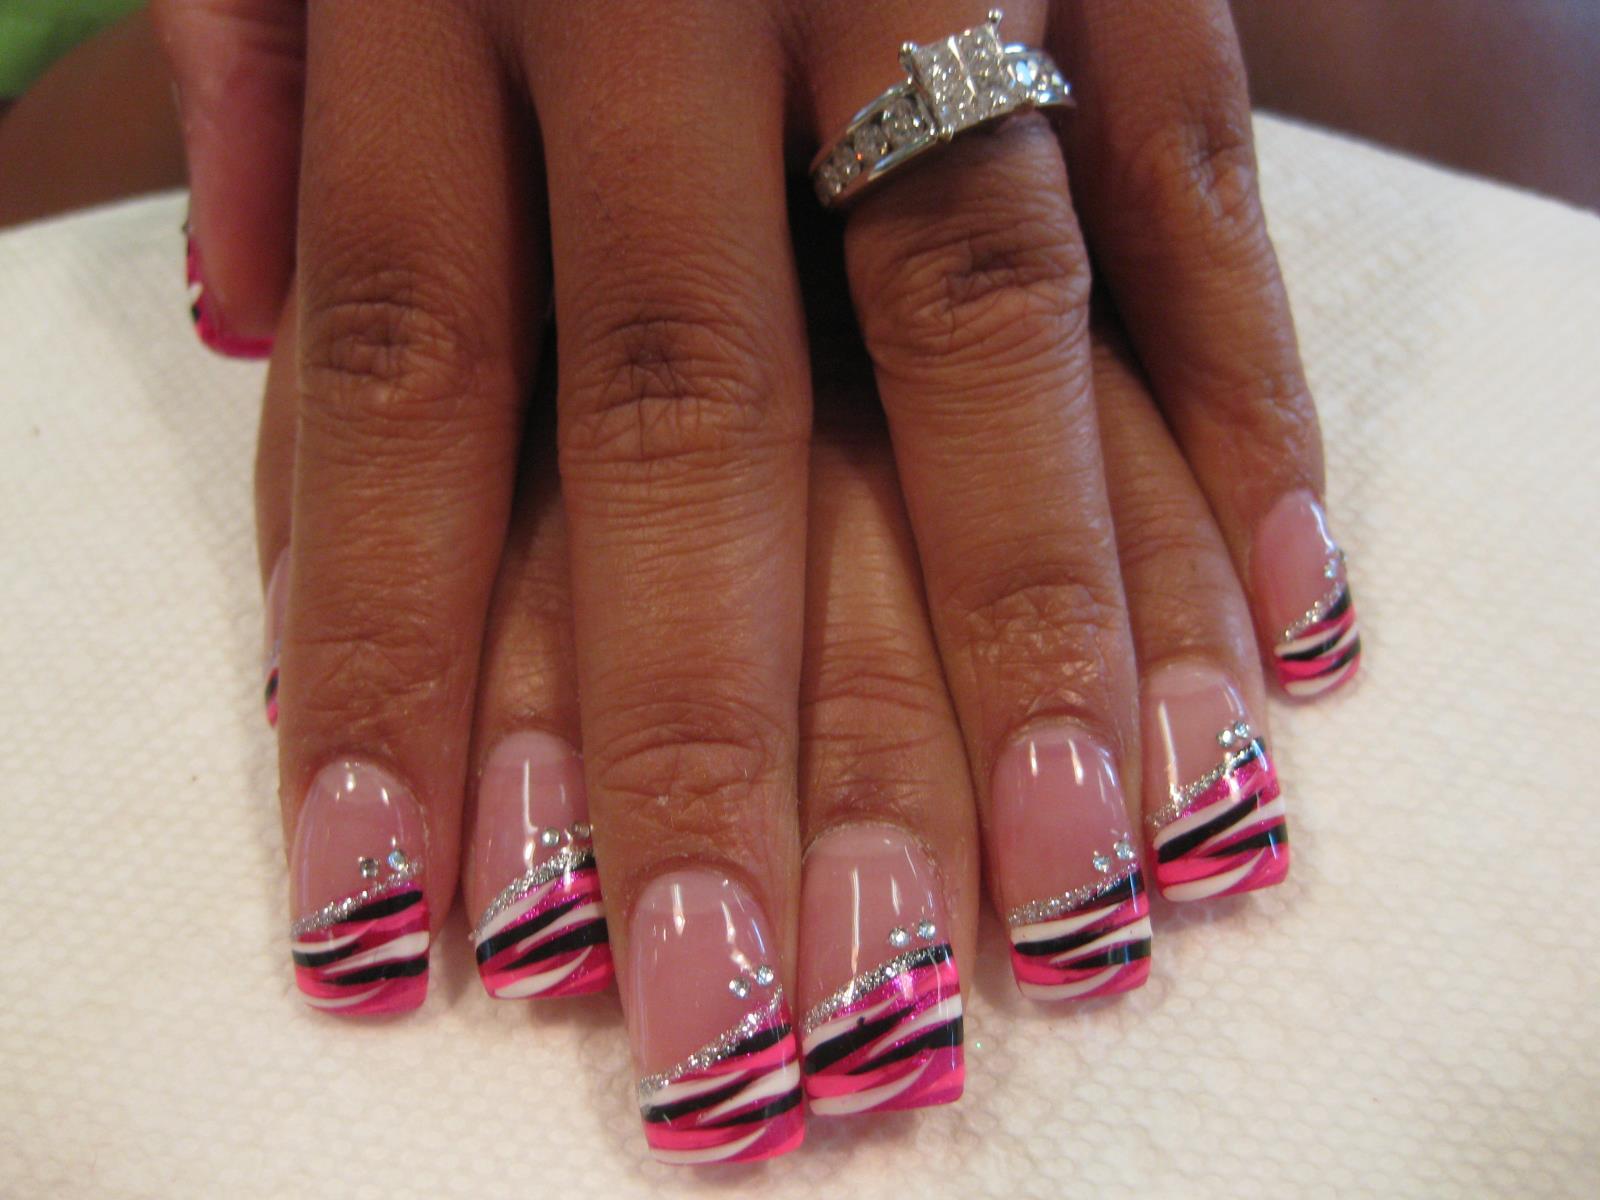 Tijuana Swirl Nail Art Design By Top Nails Clarksville Tn